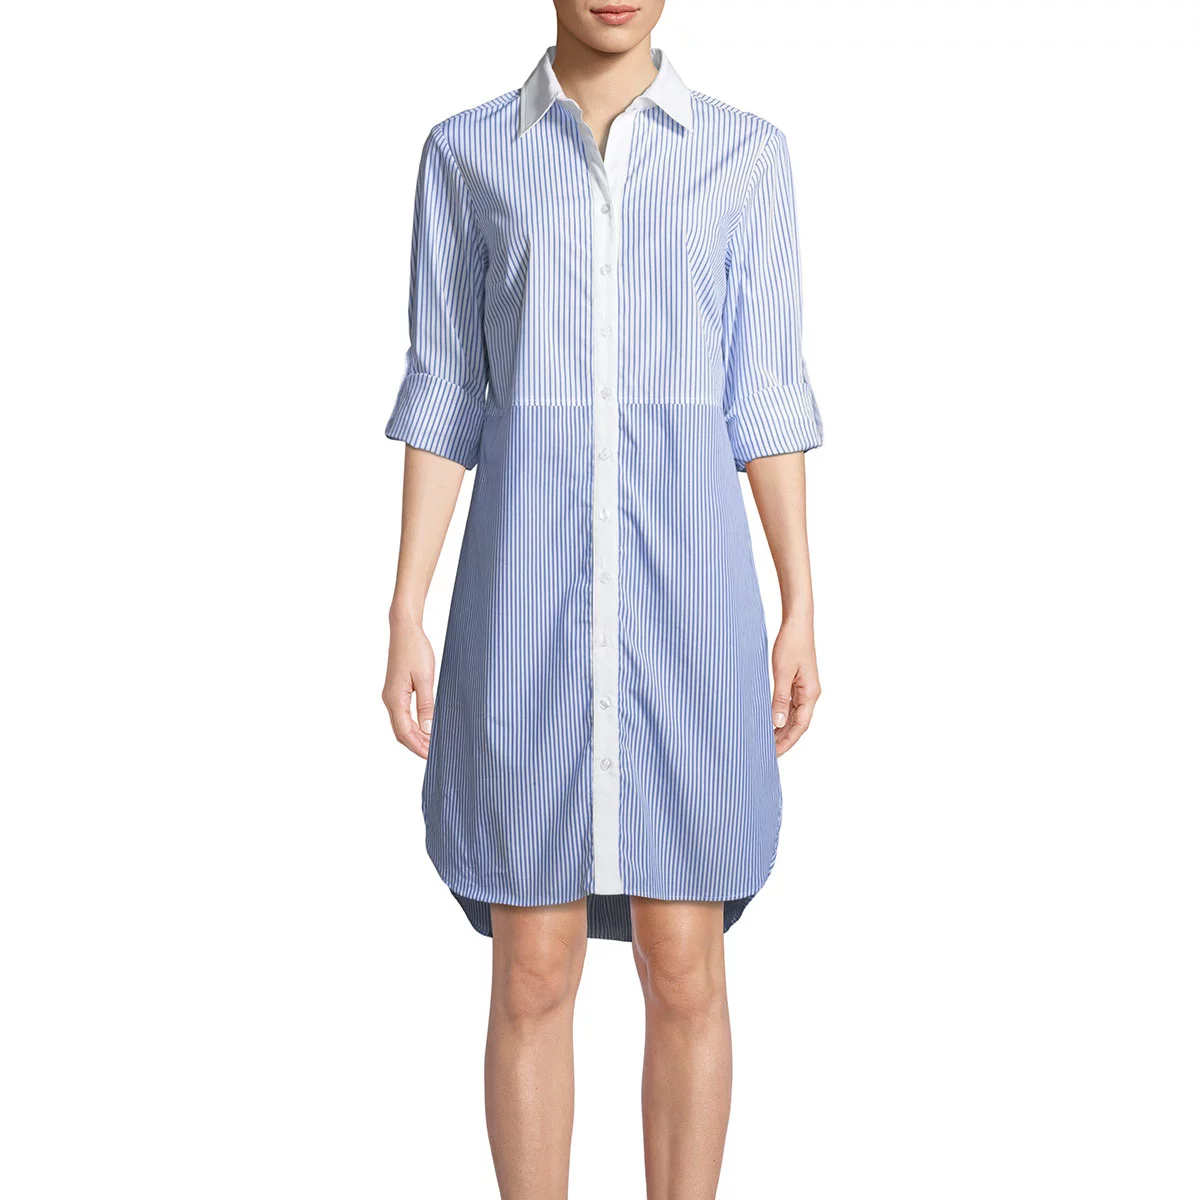 finley shirtdress nm.jpg